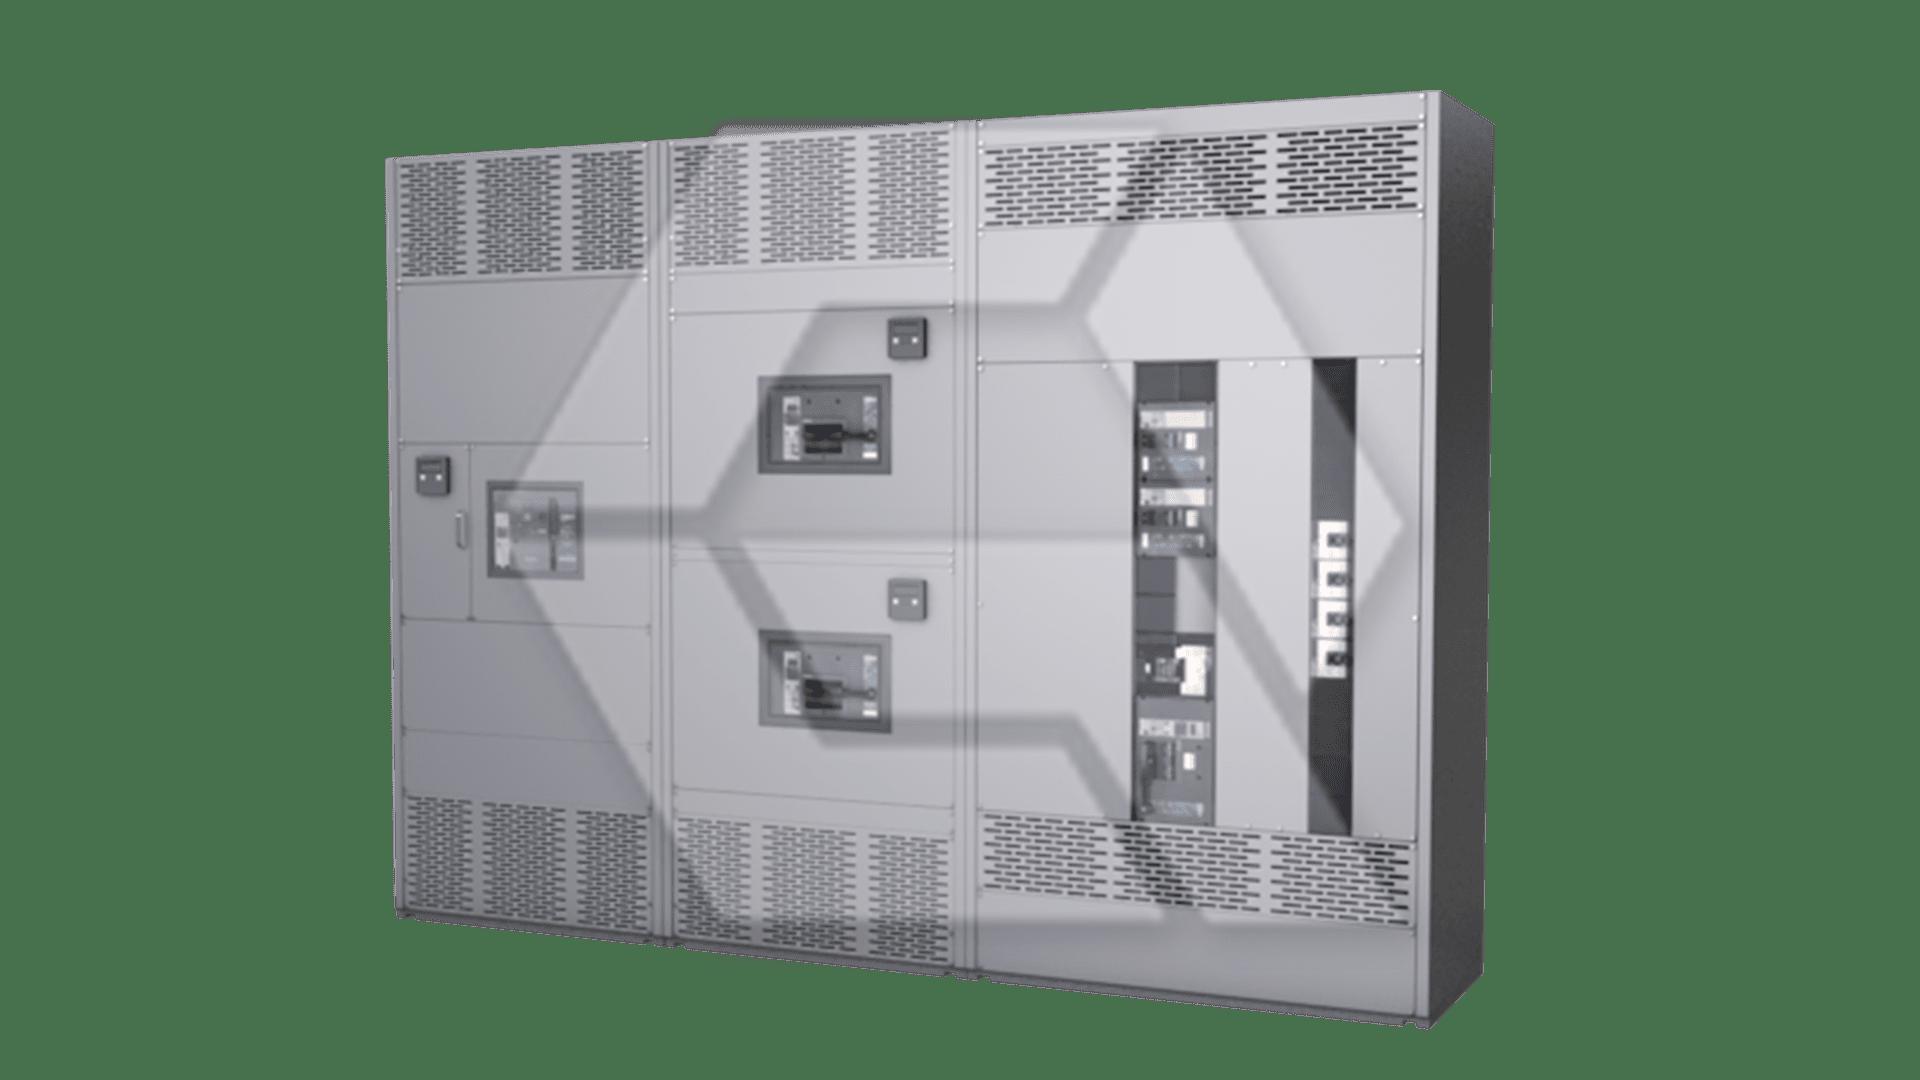 Square D Switchgear